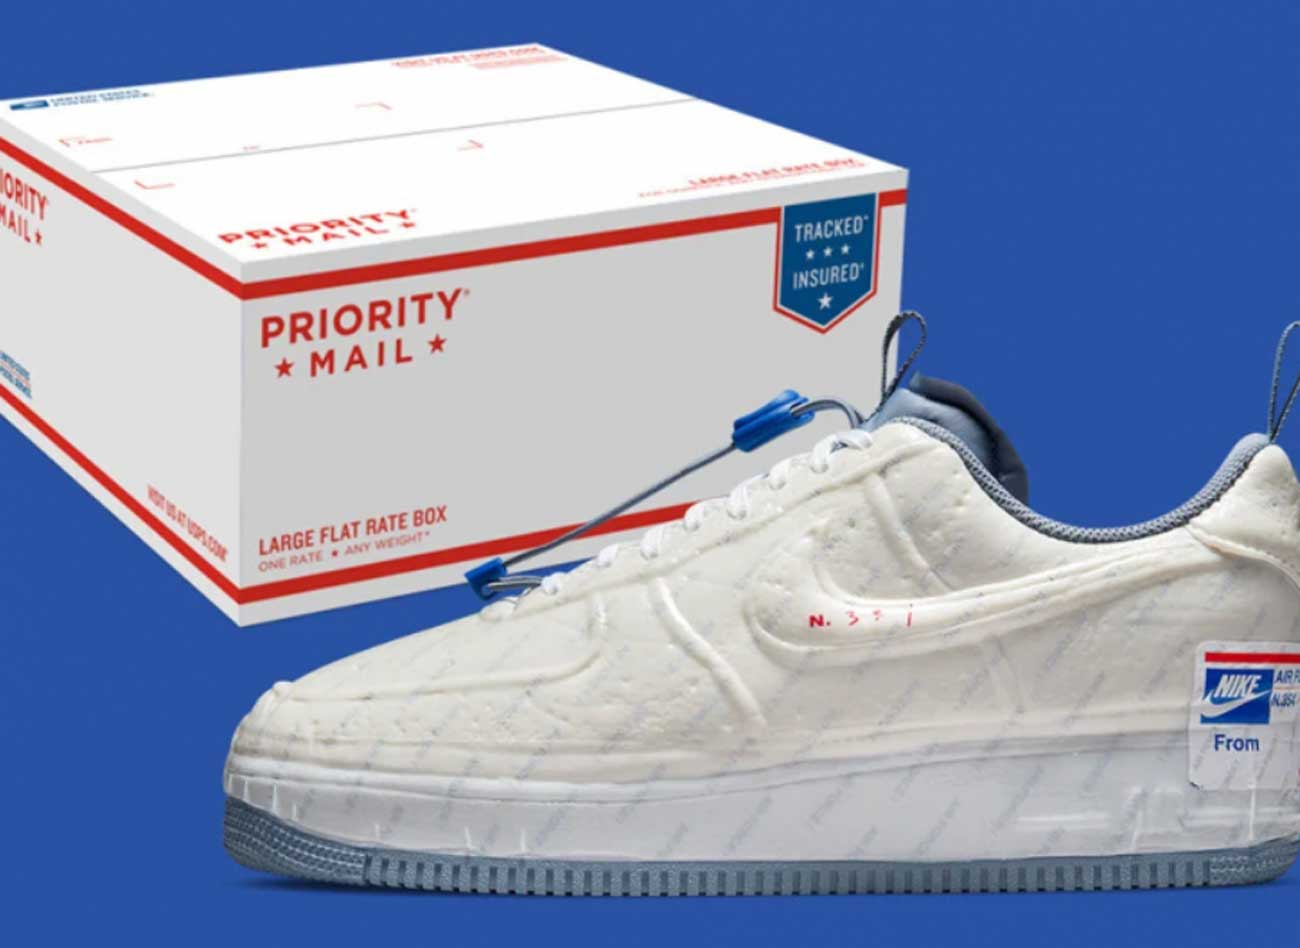 Nike-x-Ups